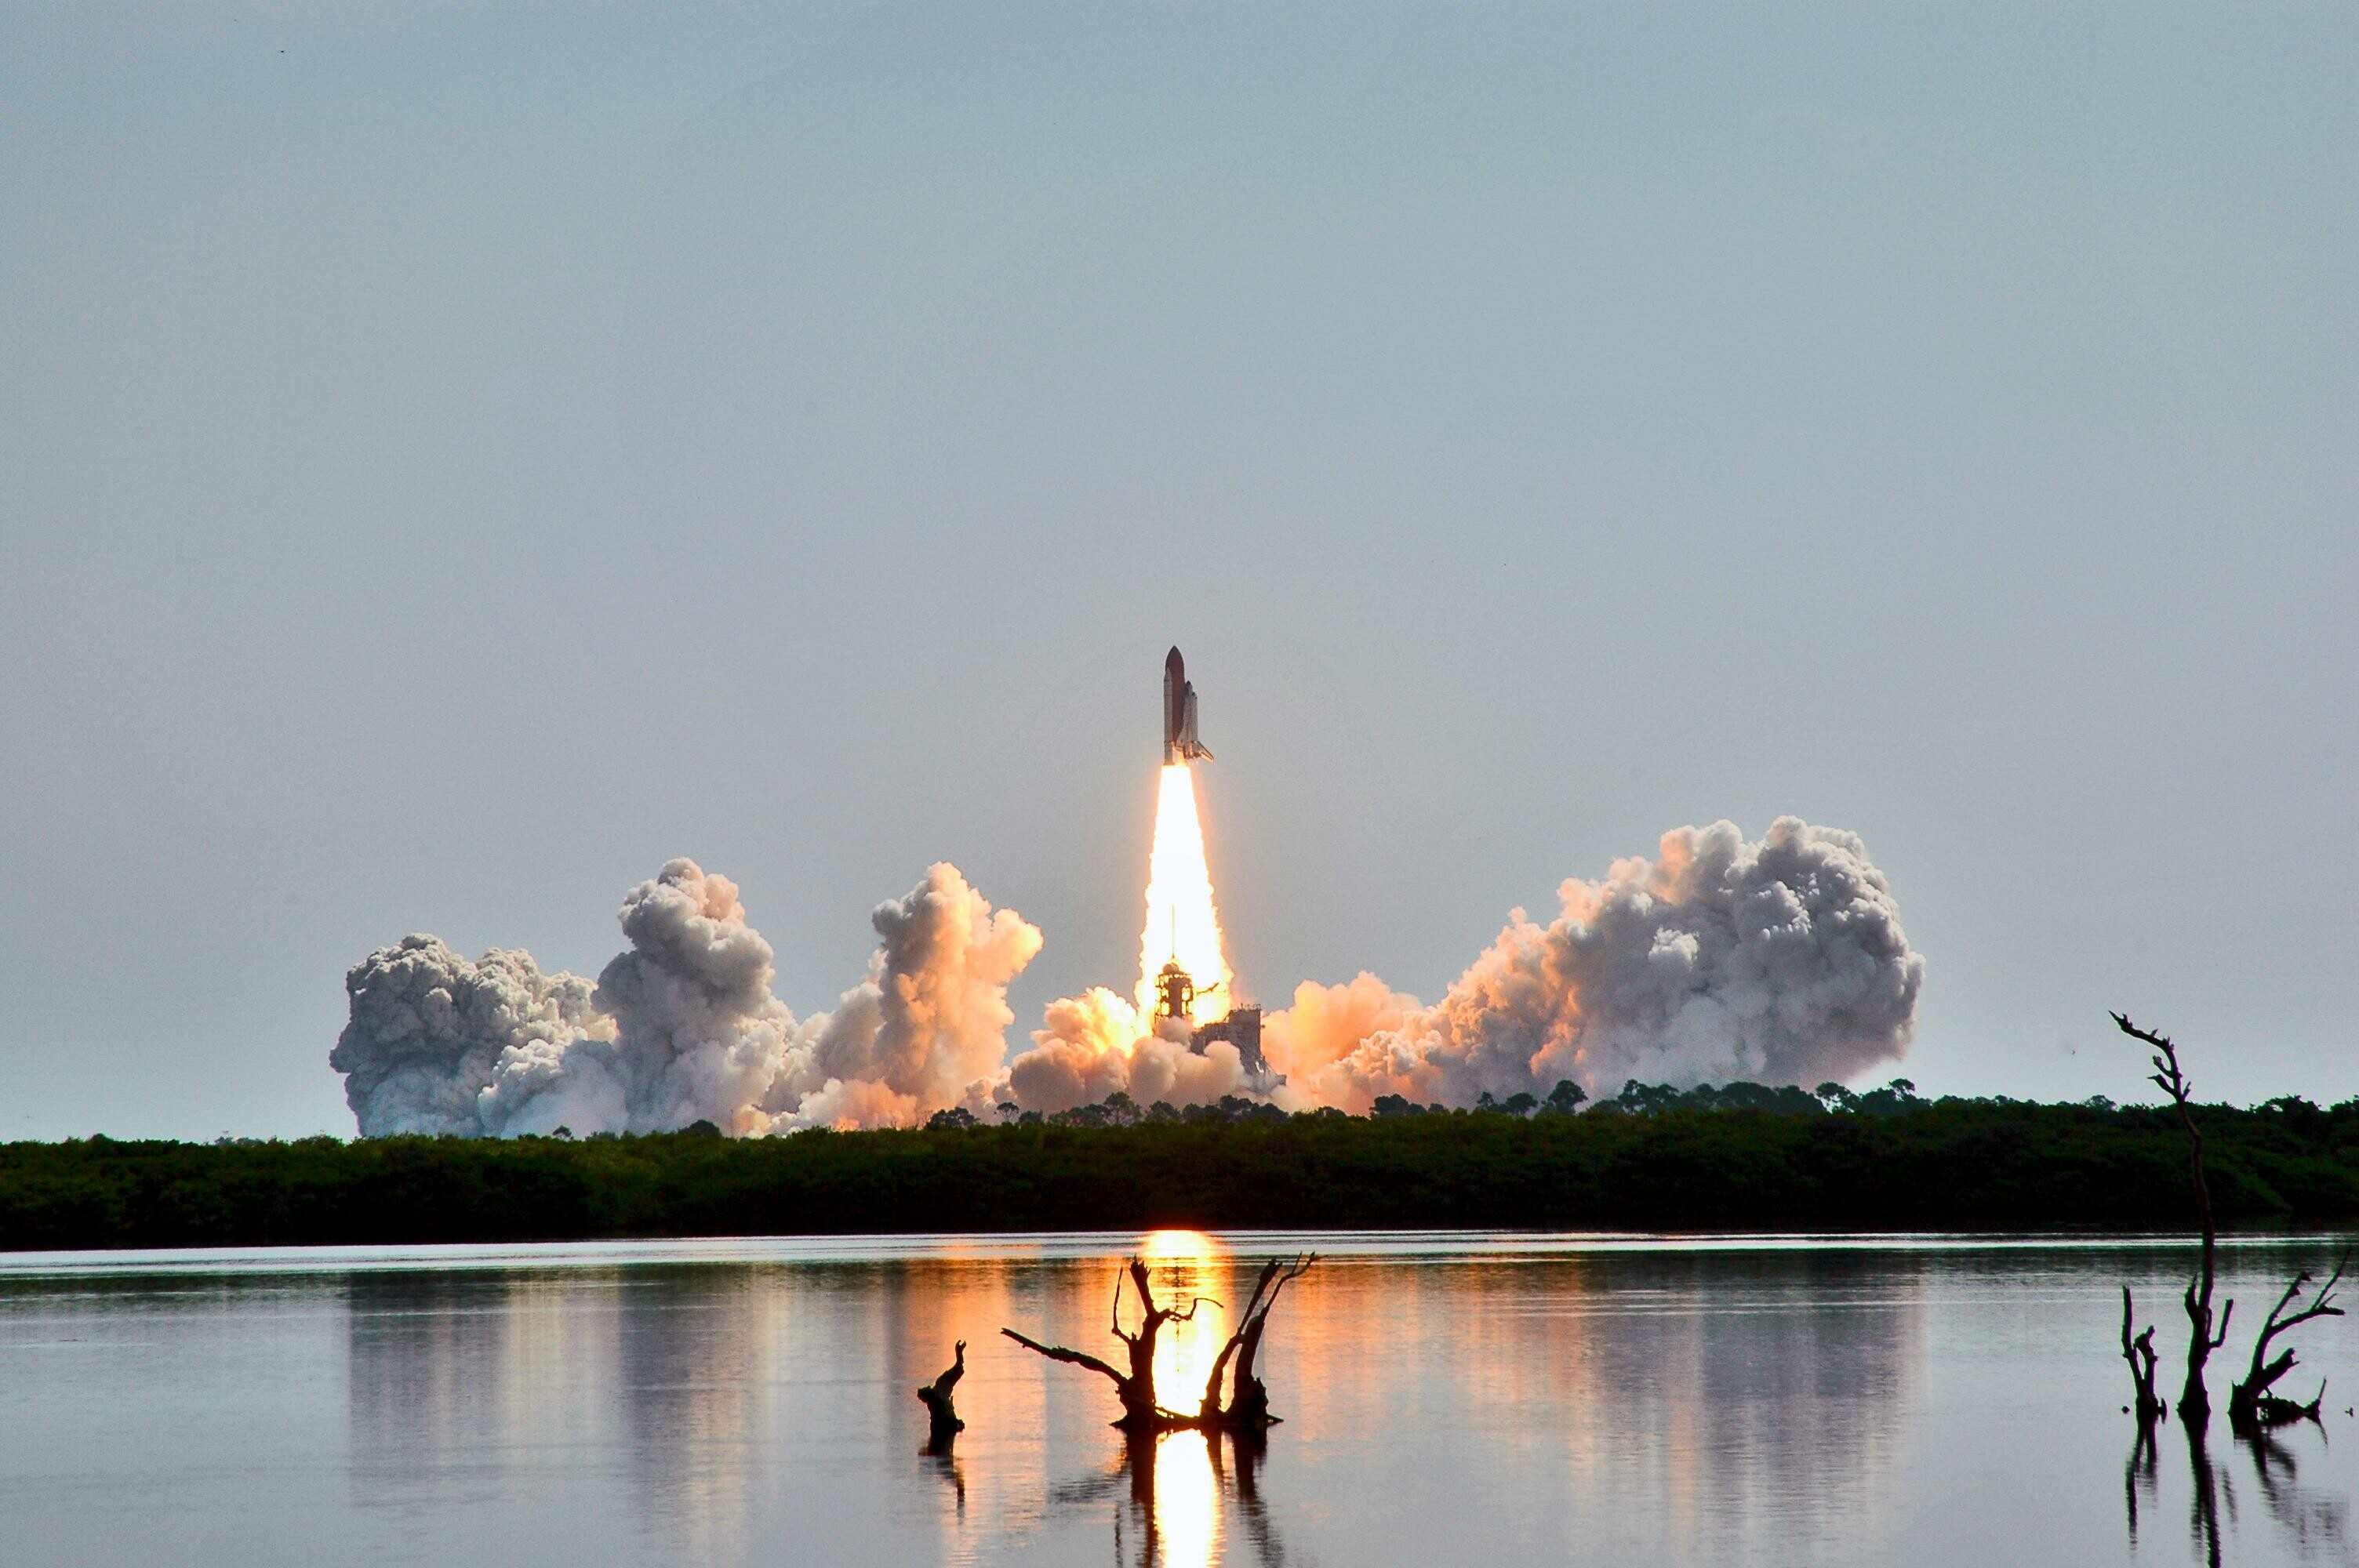 nächster space shuttle start - photo #5